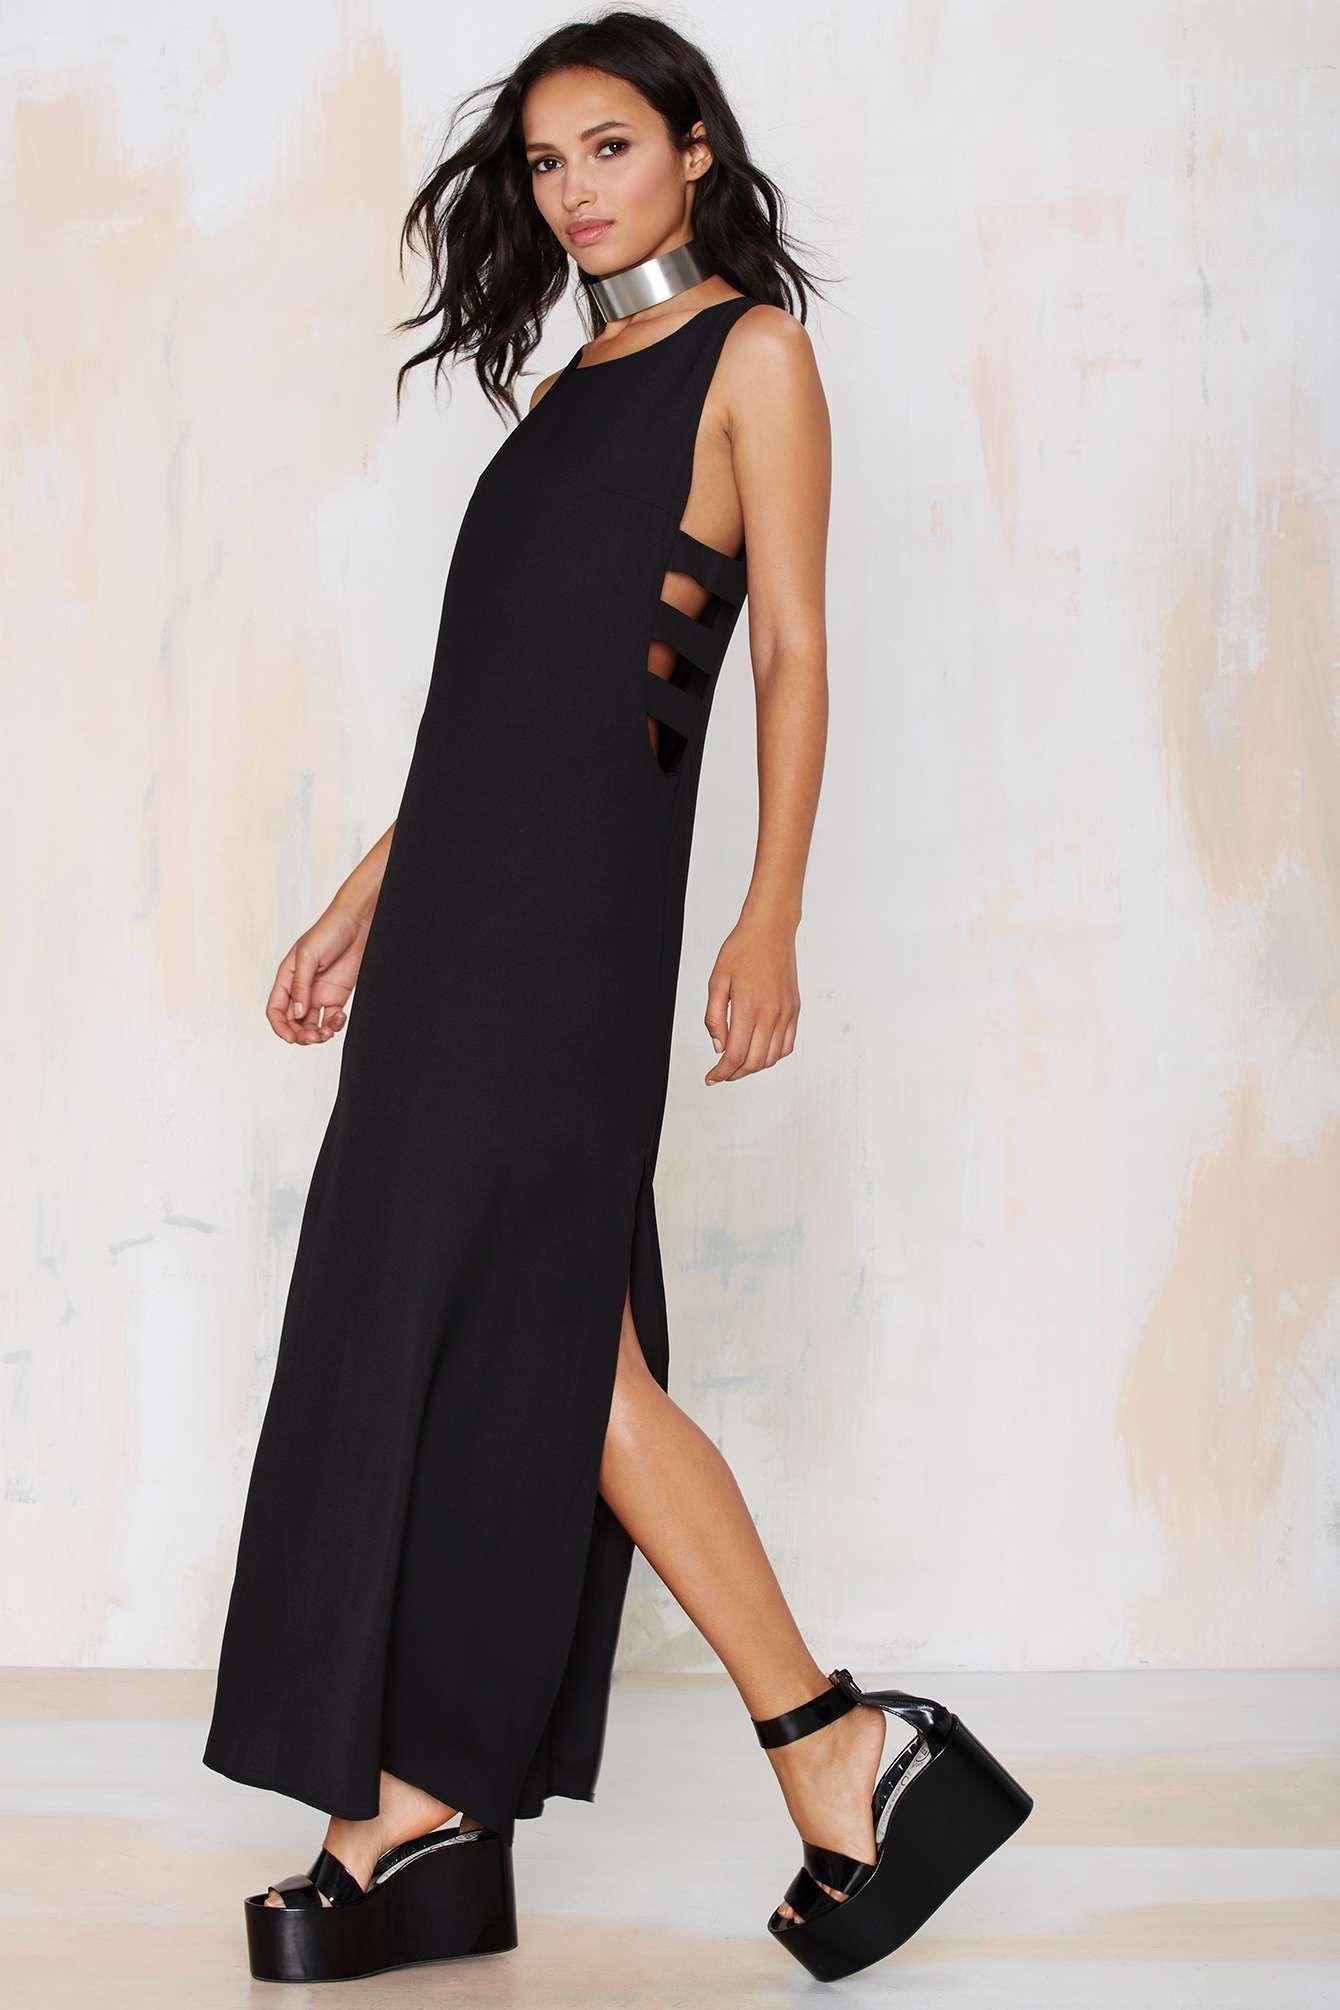 Side to side cutout dress dream closet pinterest side to side